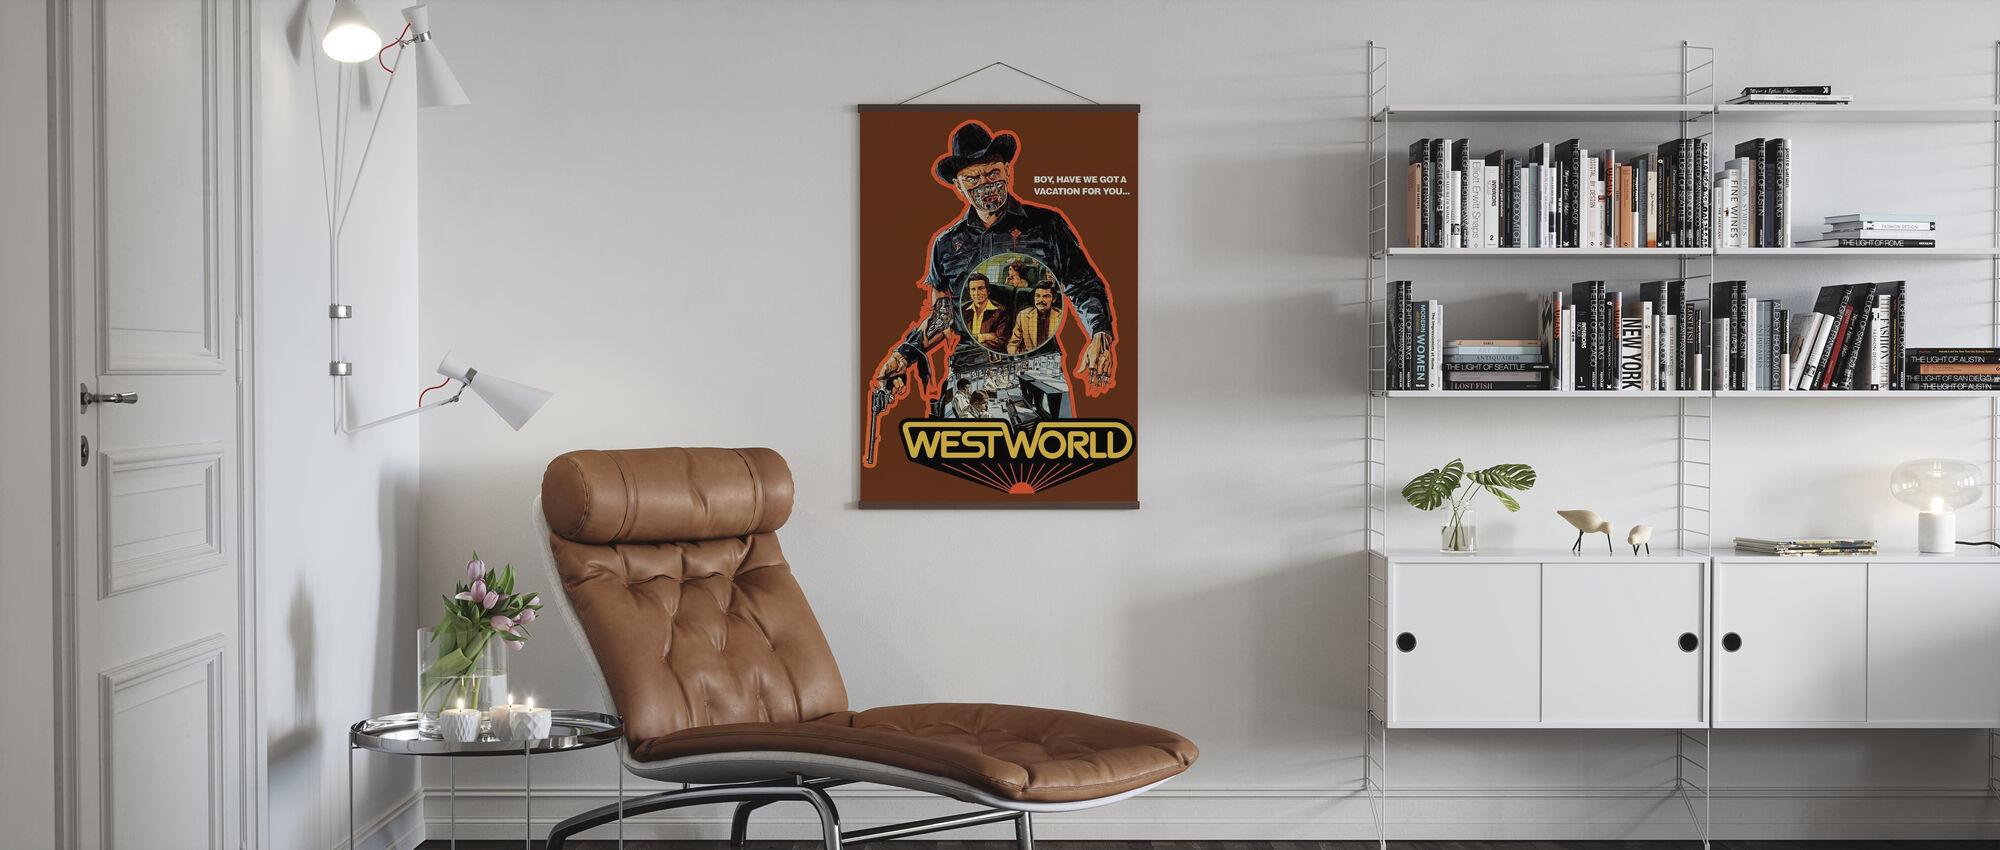 Westworld - Poster - Woonkamer